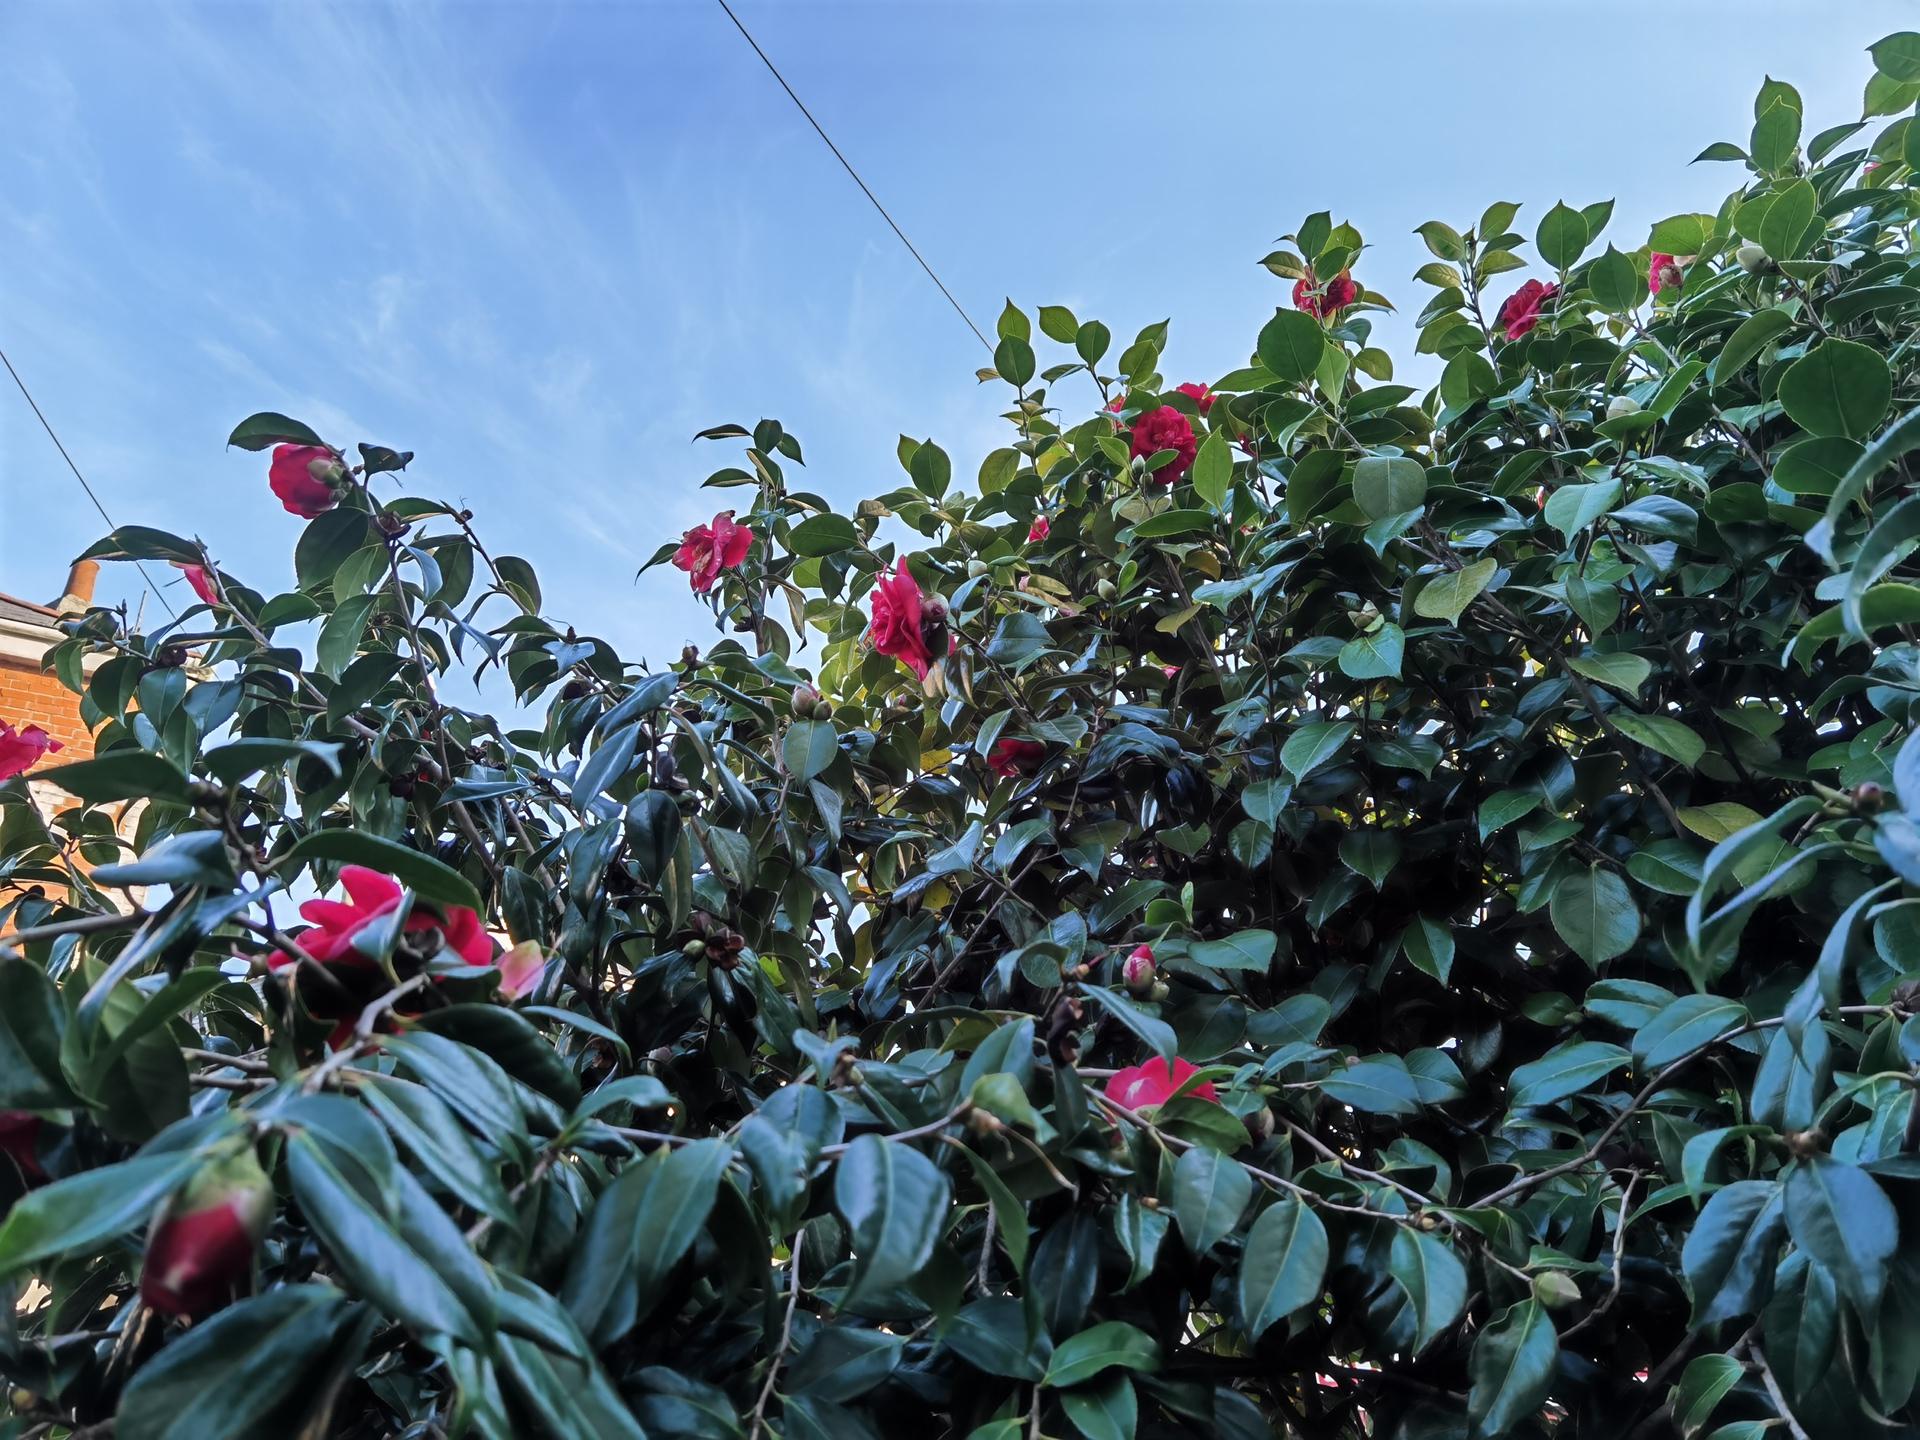 P40 Pro camera sample HDR test of a bush